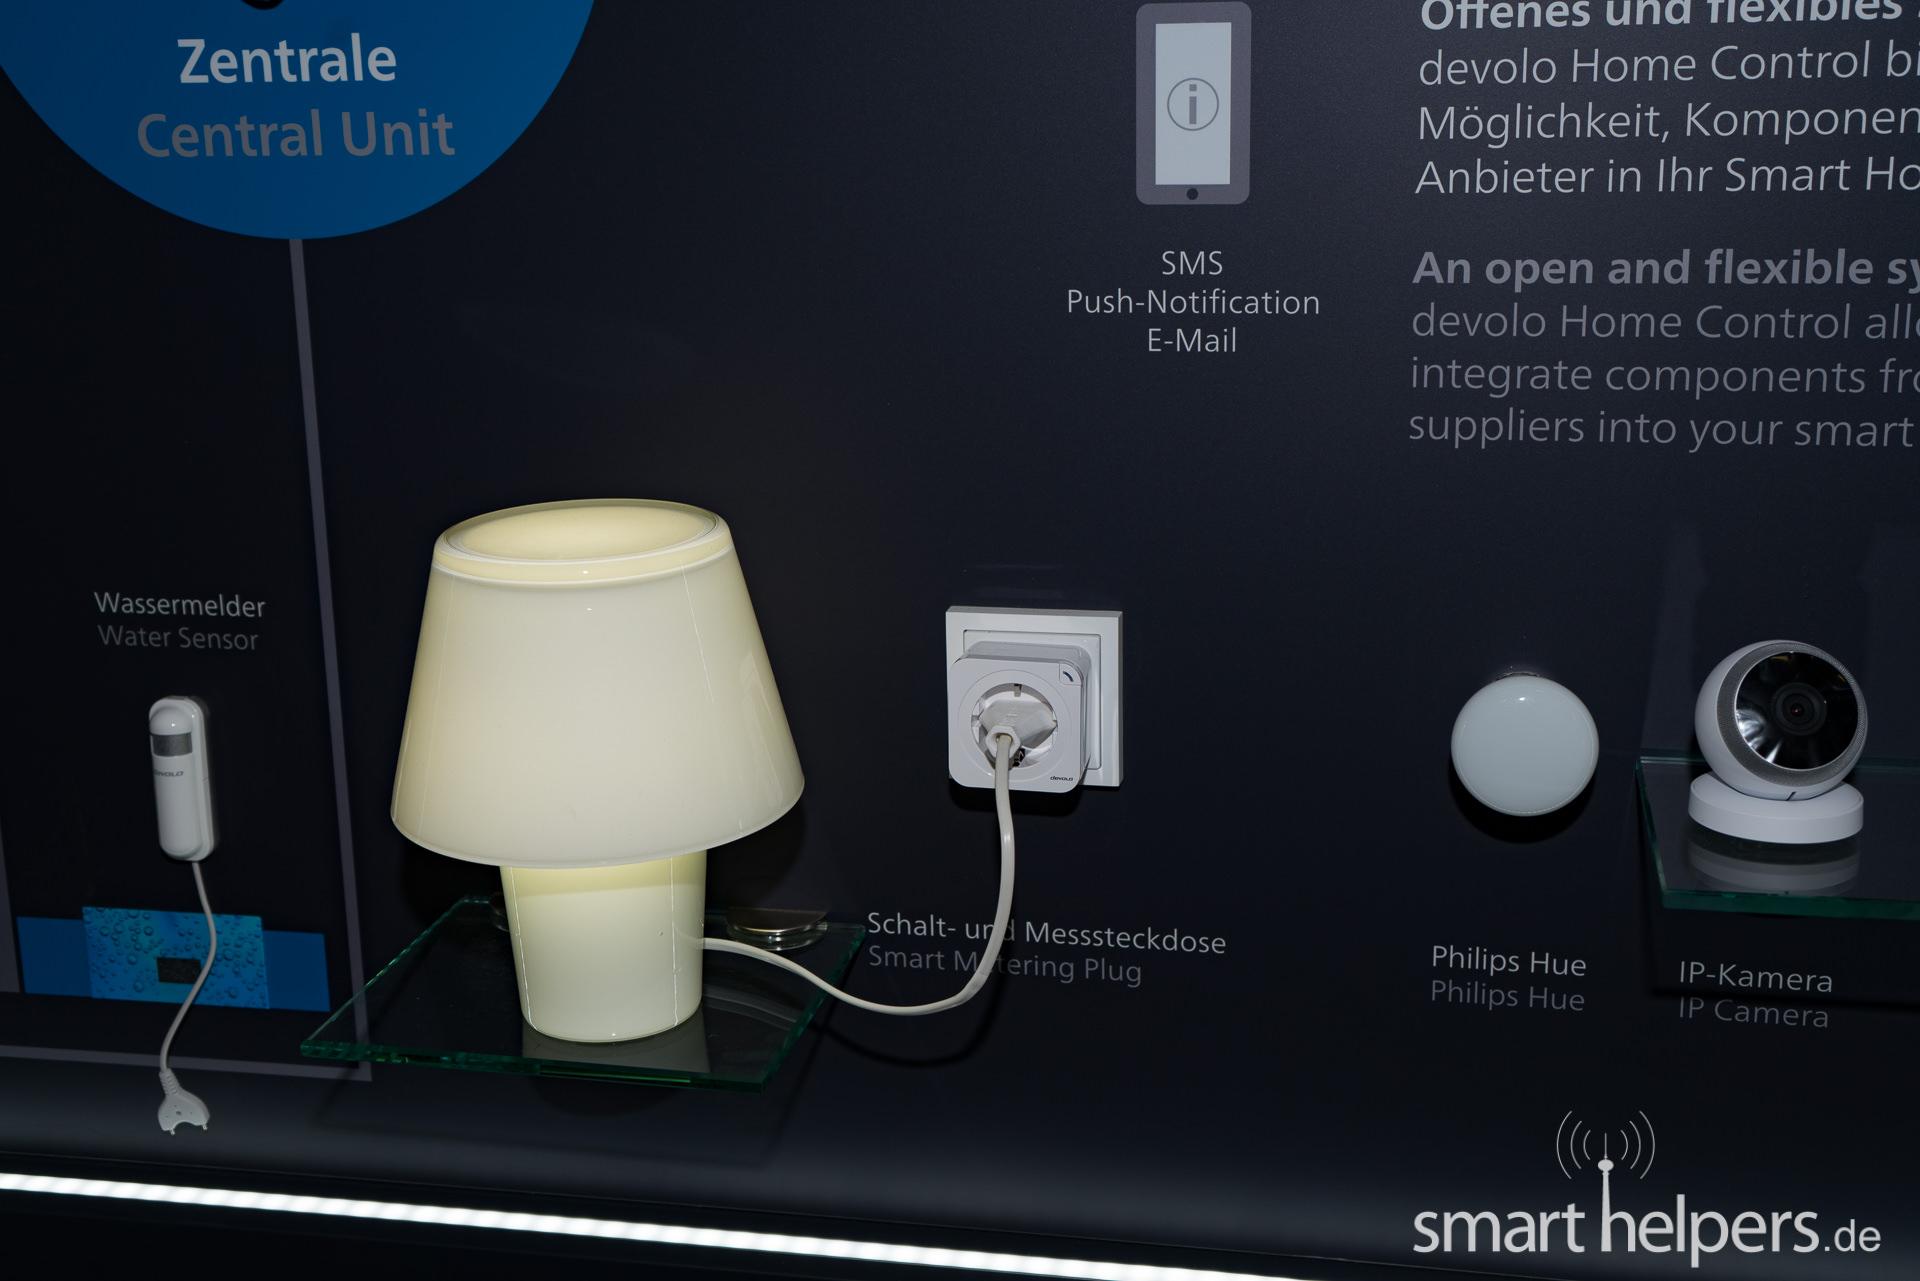 smart home systeme vergleich smart home systeme vergleich. Black Bedroom Furniture Sets. Home Design Ideas